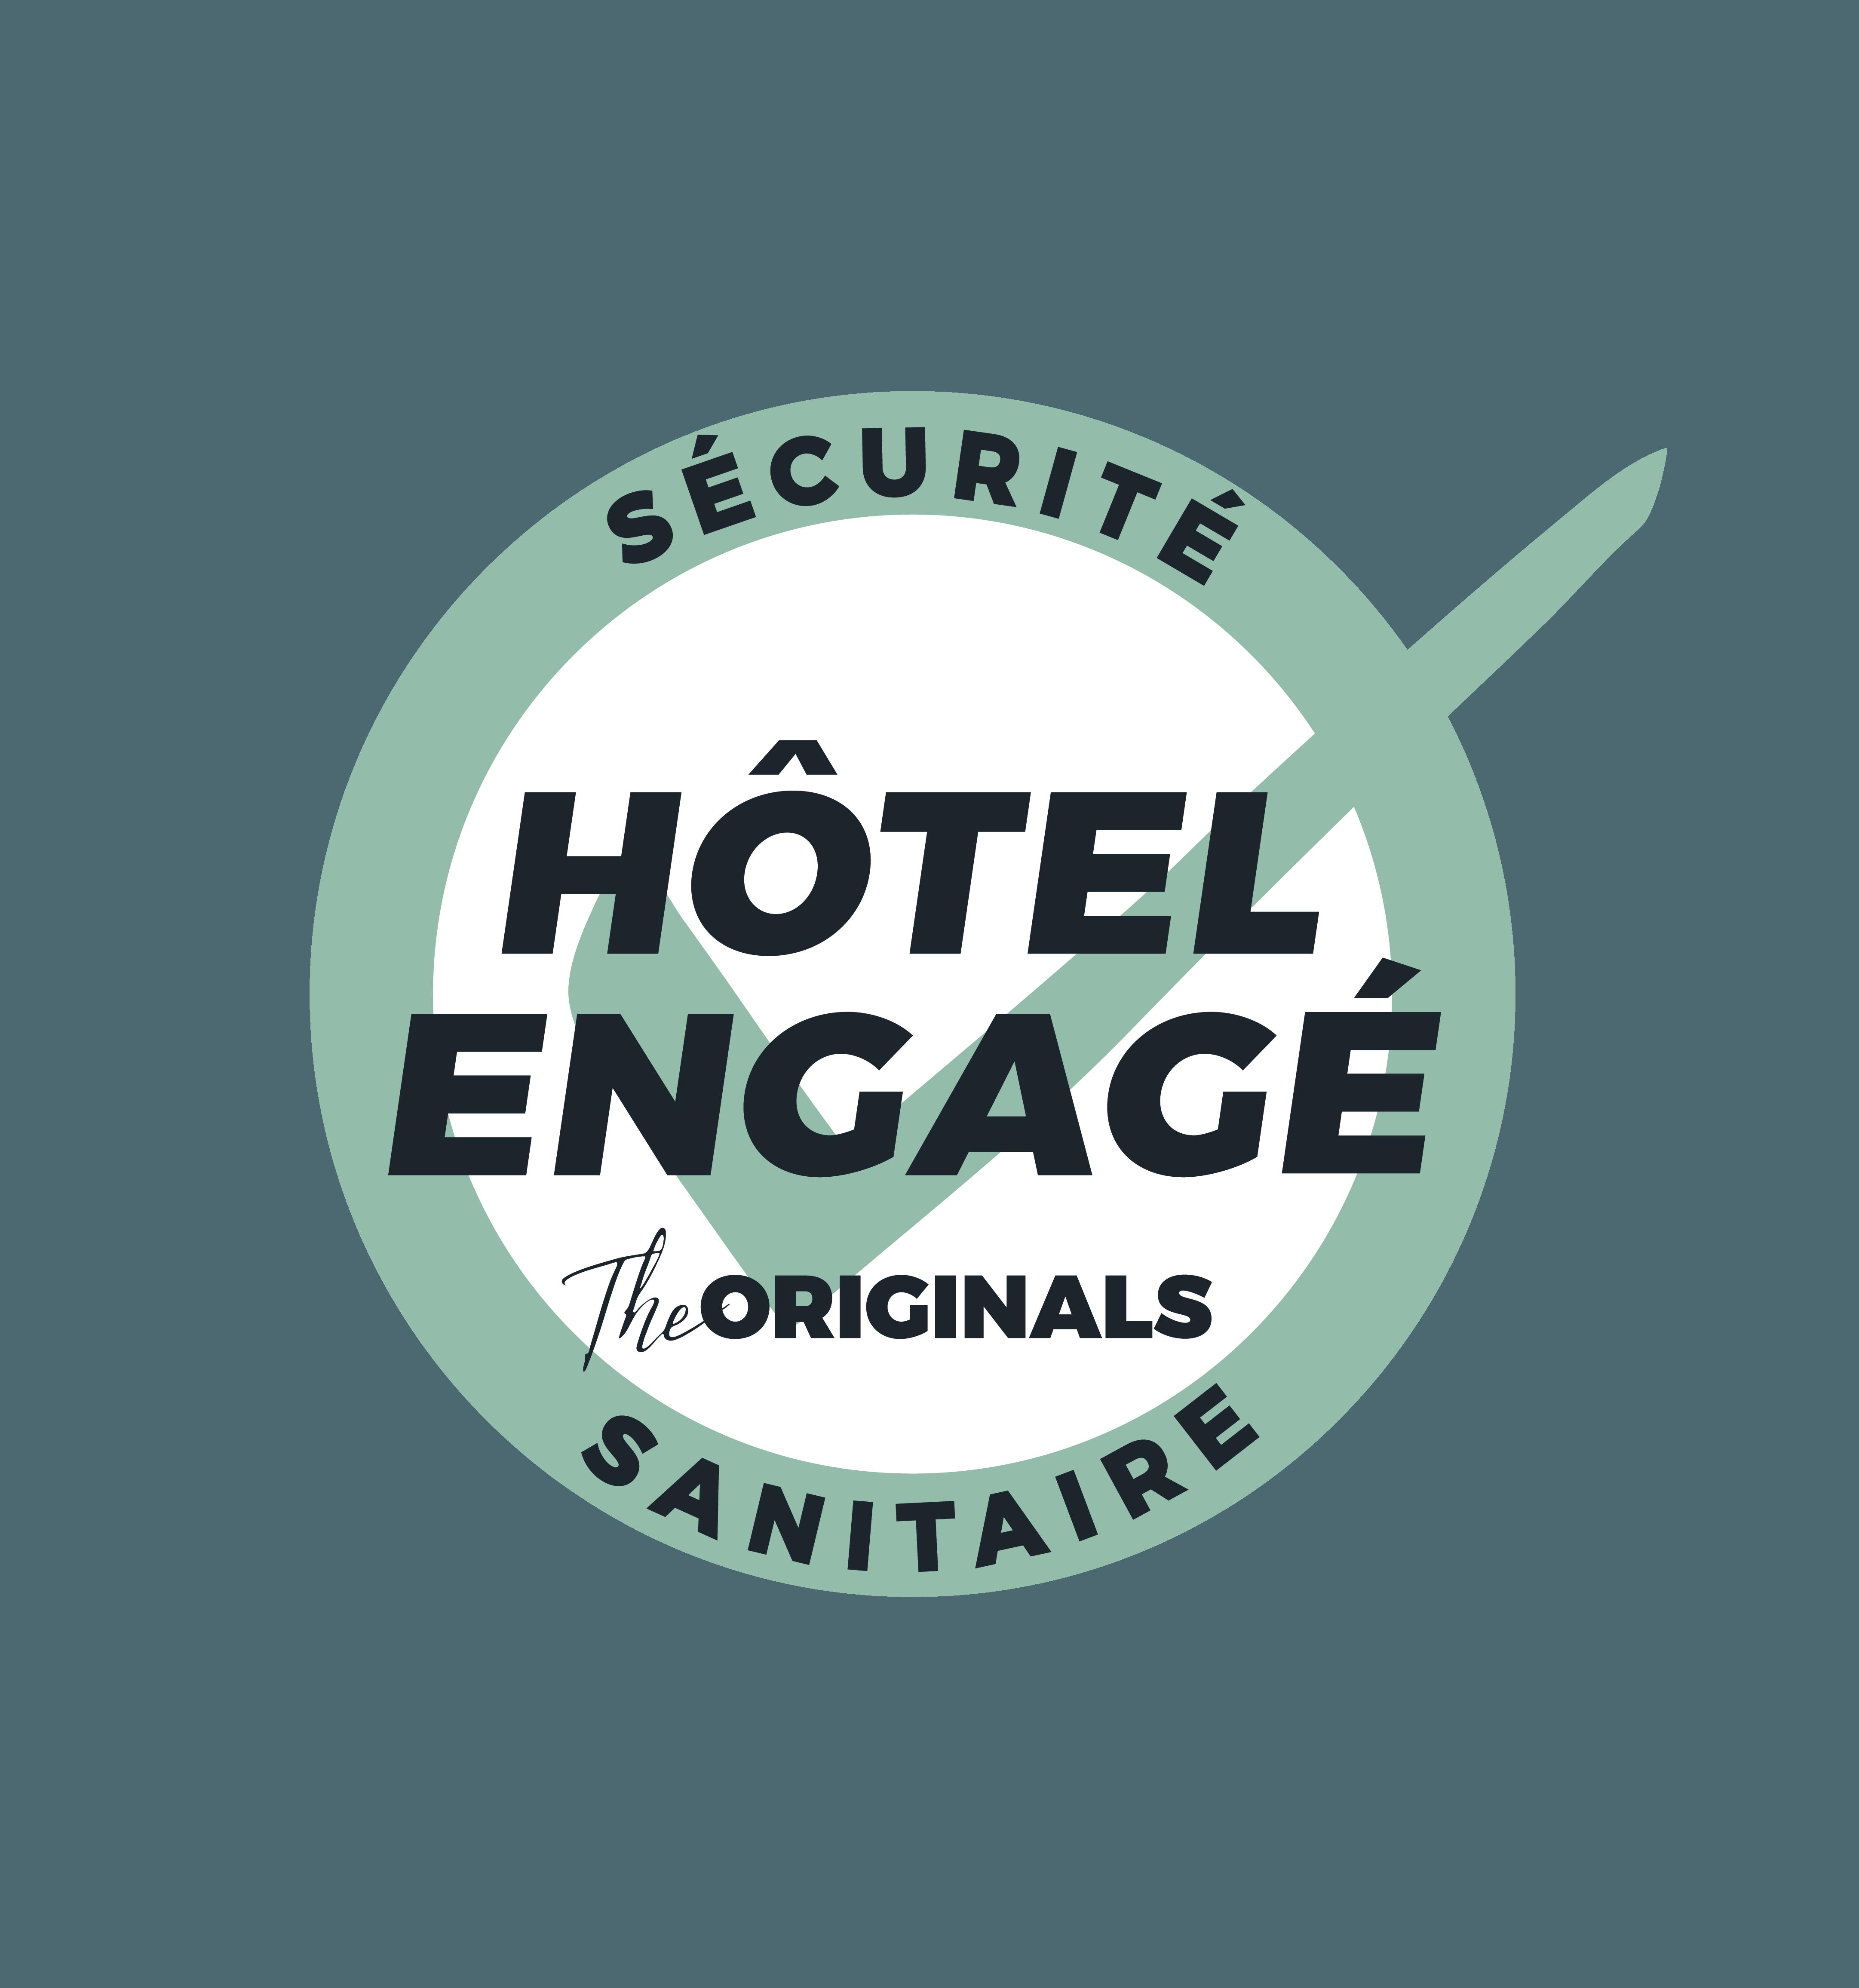 Hotel engagé